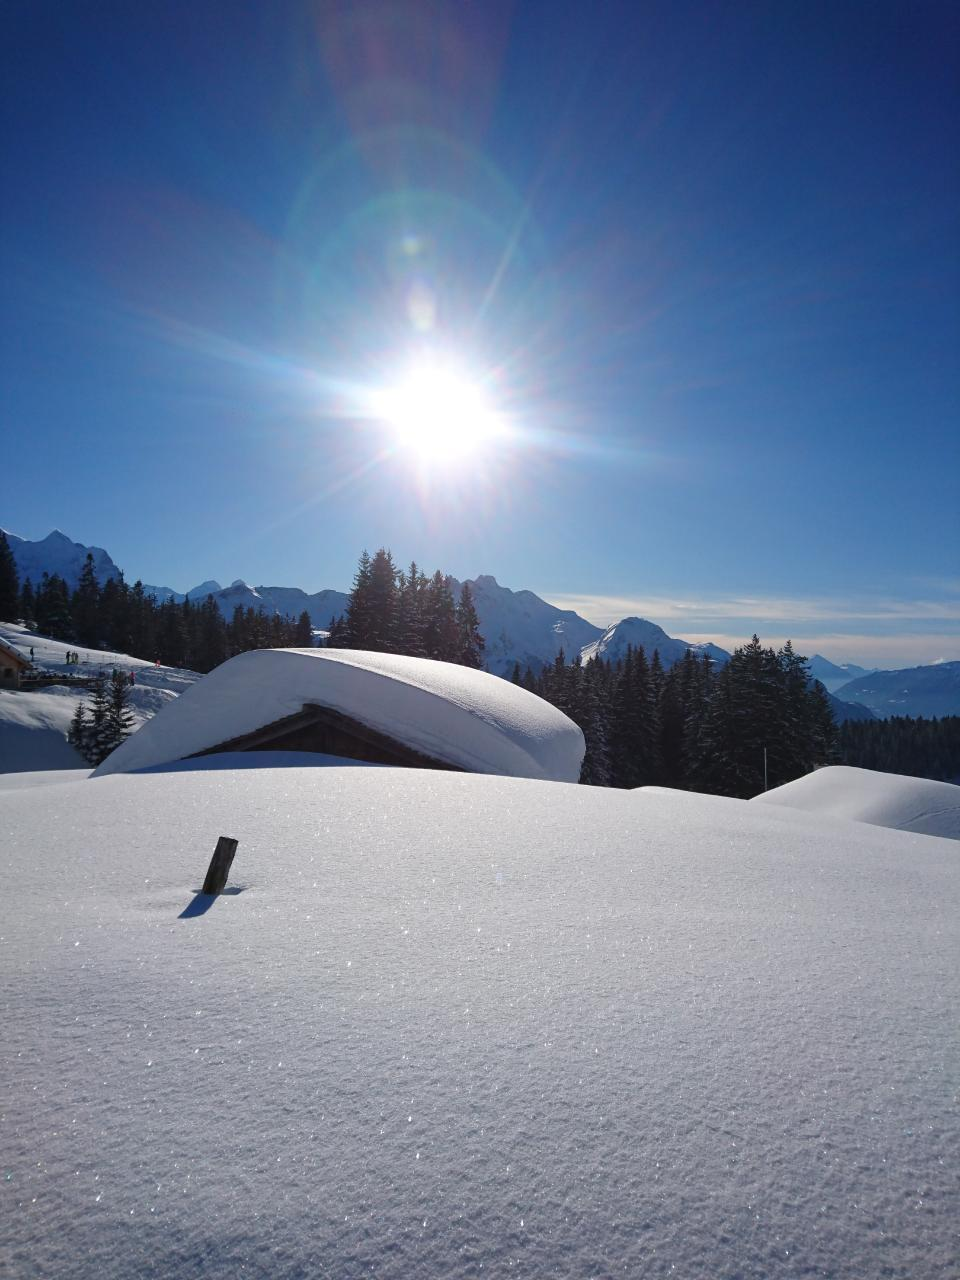 Ferienwohnung Obererli 4-Bettwohnung (2692316), Hasliberg Hohfluh, Meiringen - Hasliberg, Berner Oberland, Schweiz, Bild 16